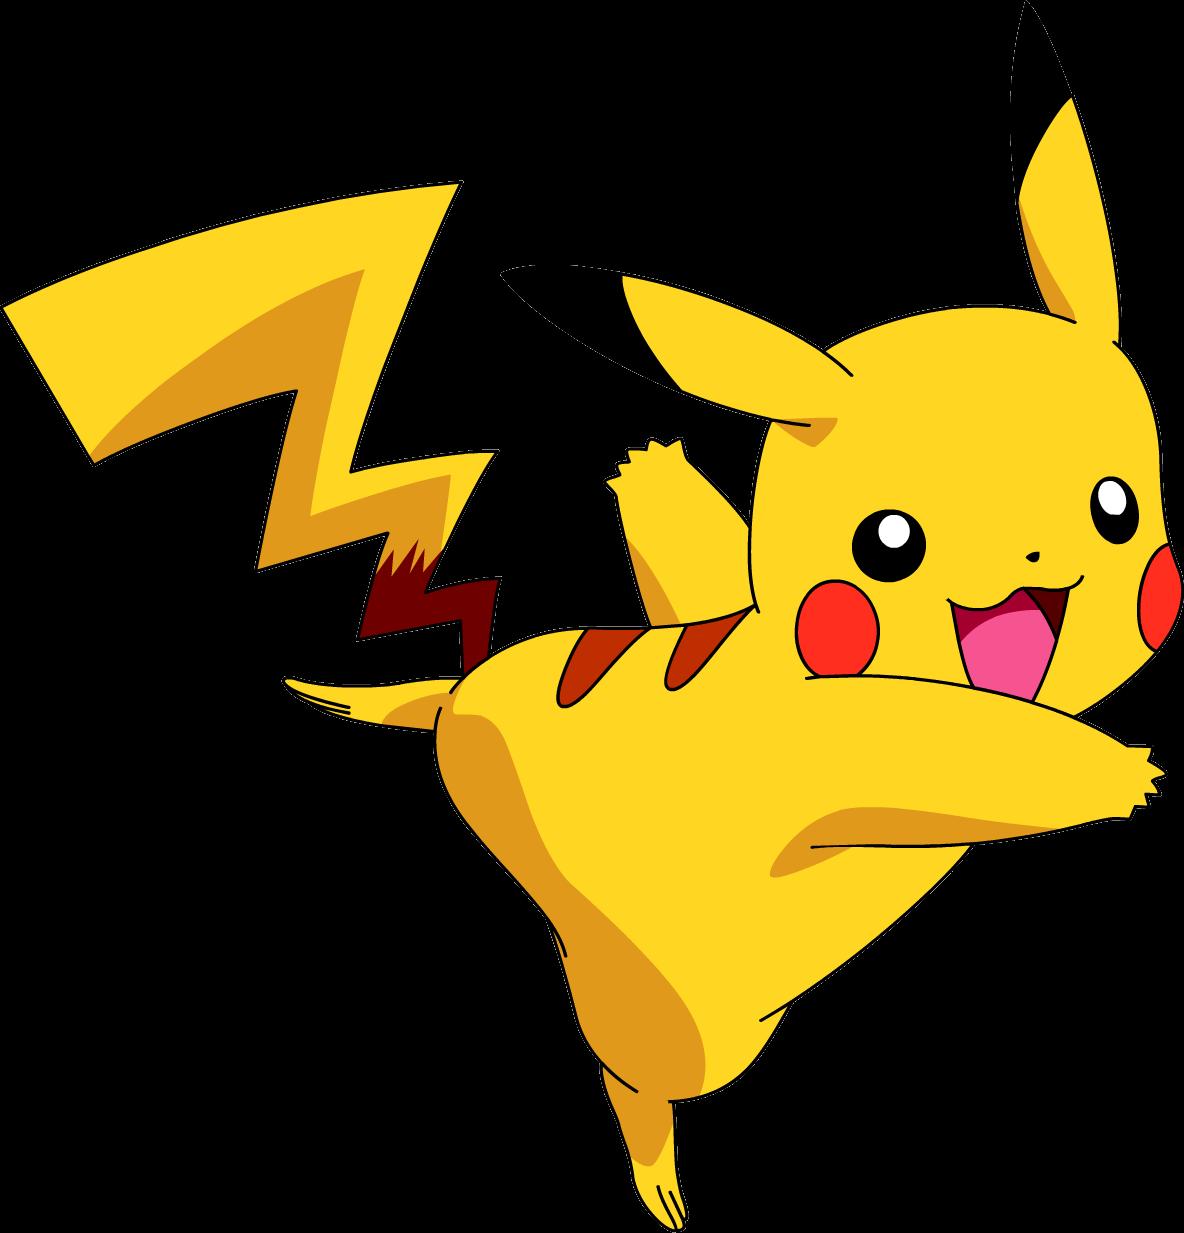 Pokemon clipart outline. Png images transparent free